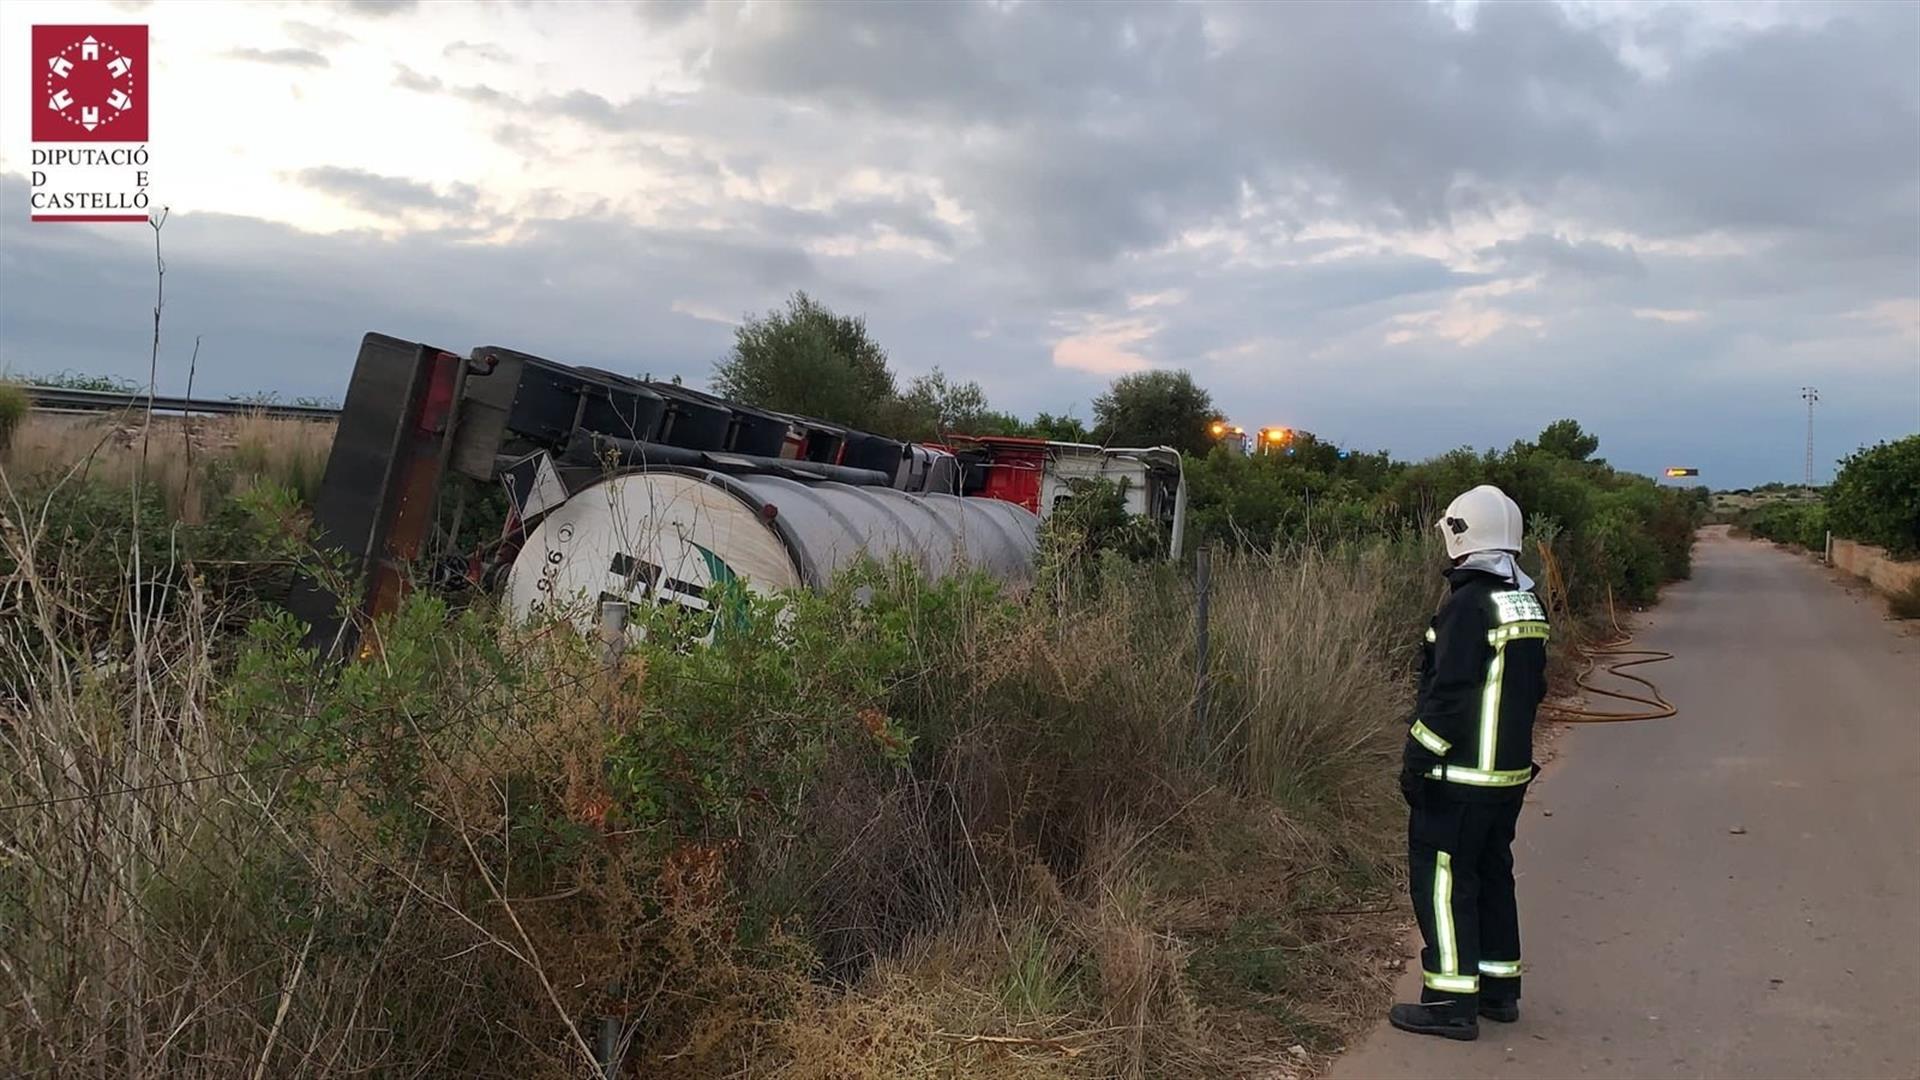 ACCIDENTE AP-7  Vuelca un camión cisterna con 25.000 litros de sosa cáustica